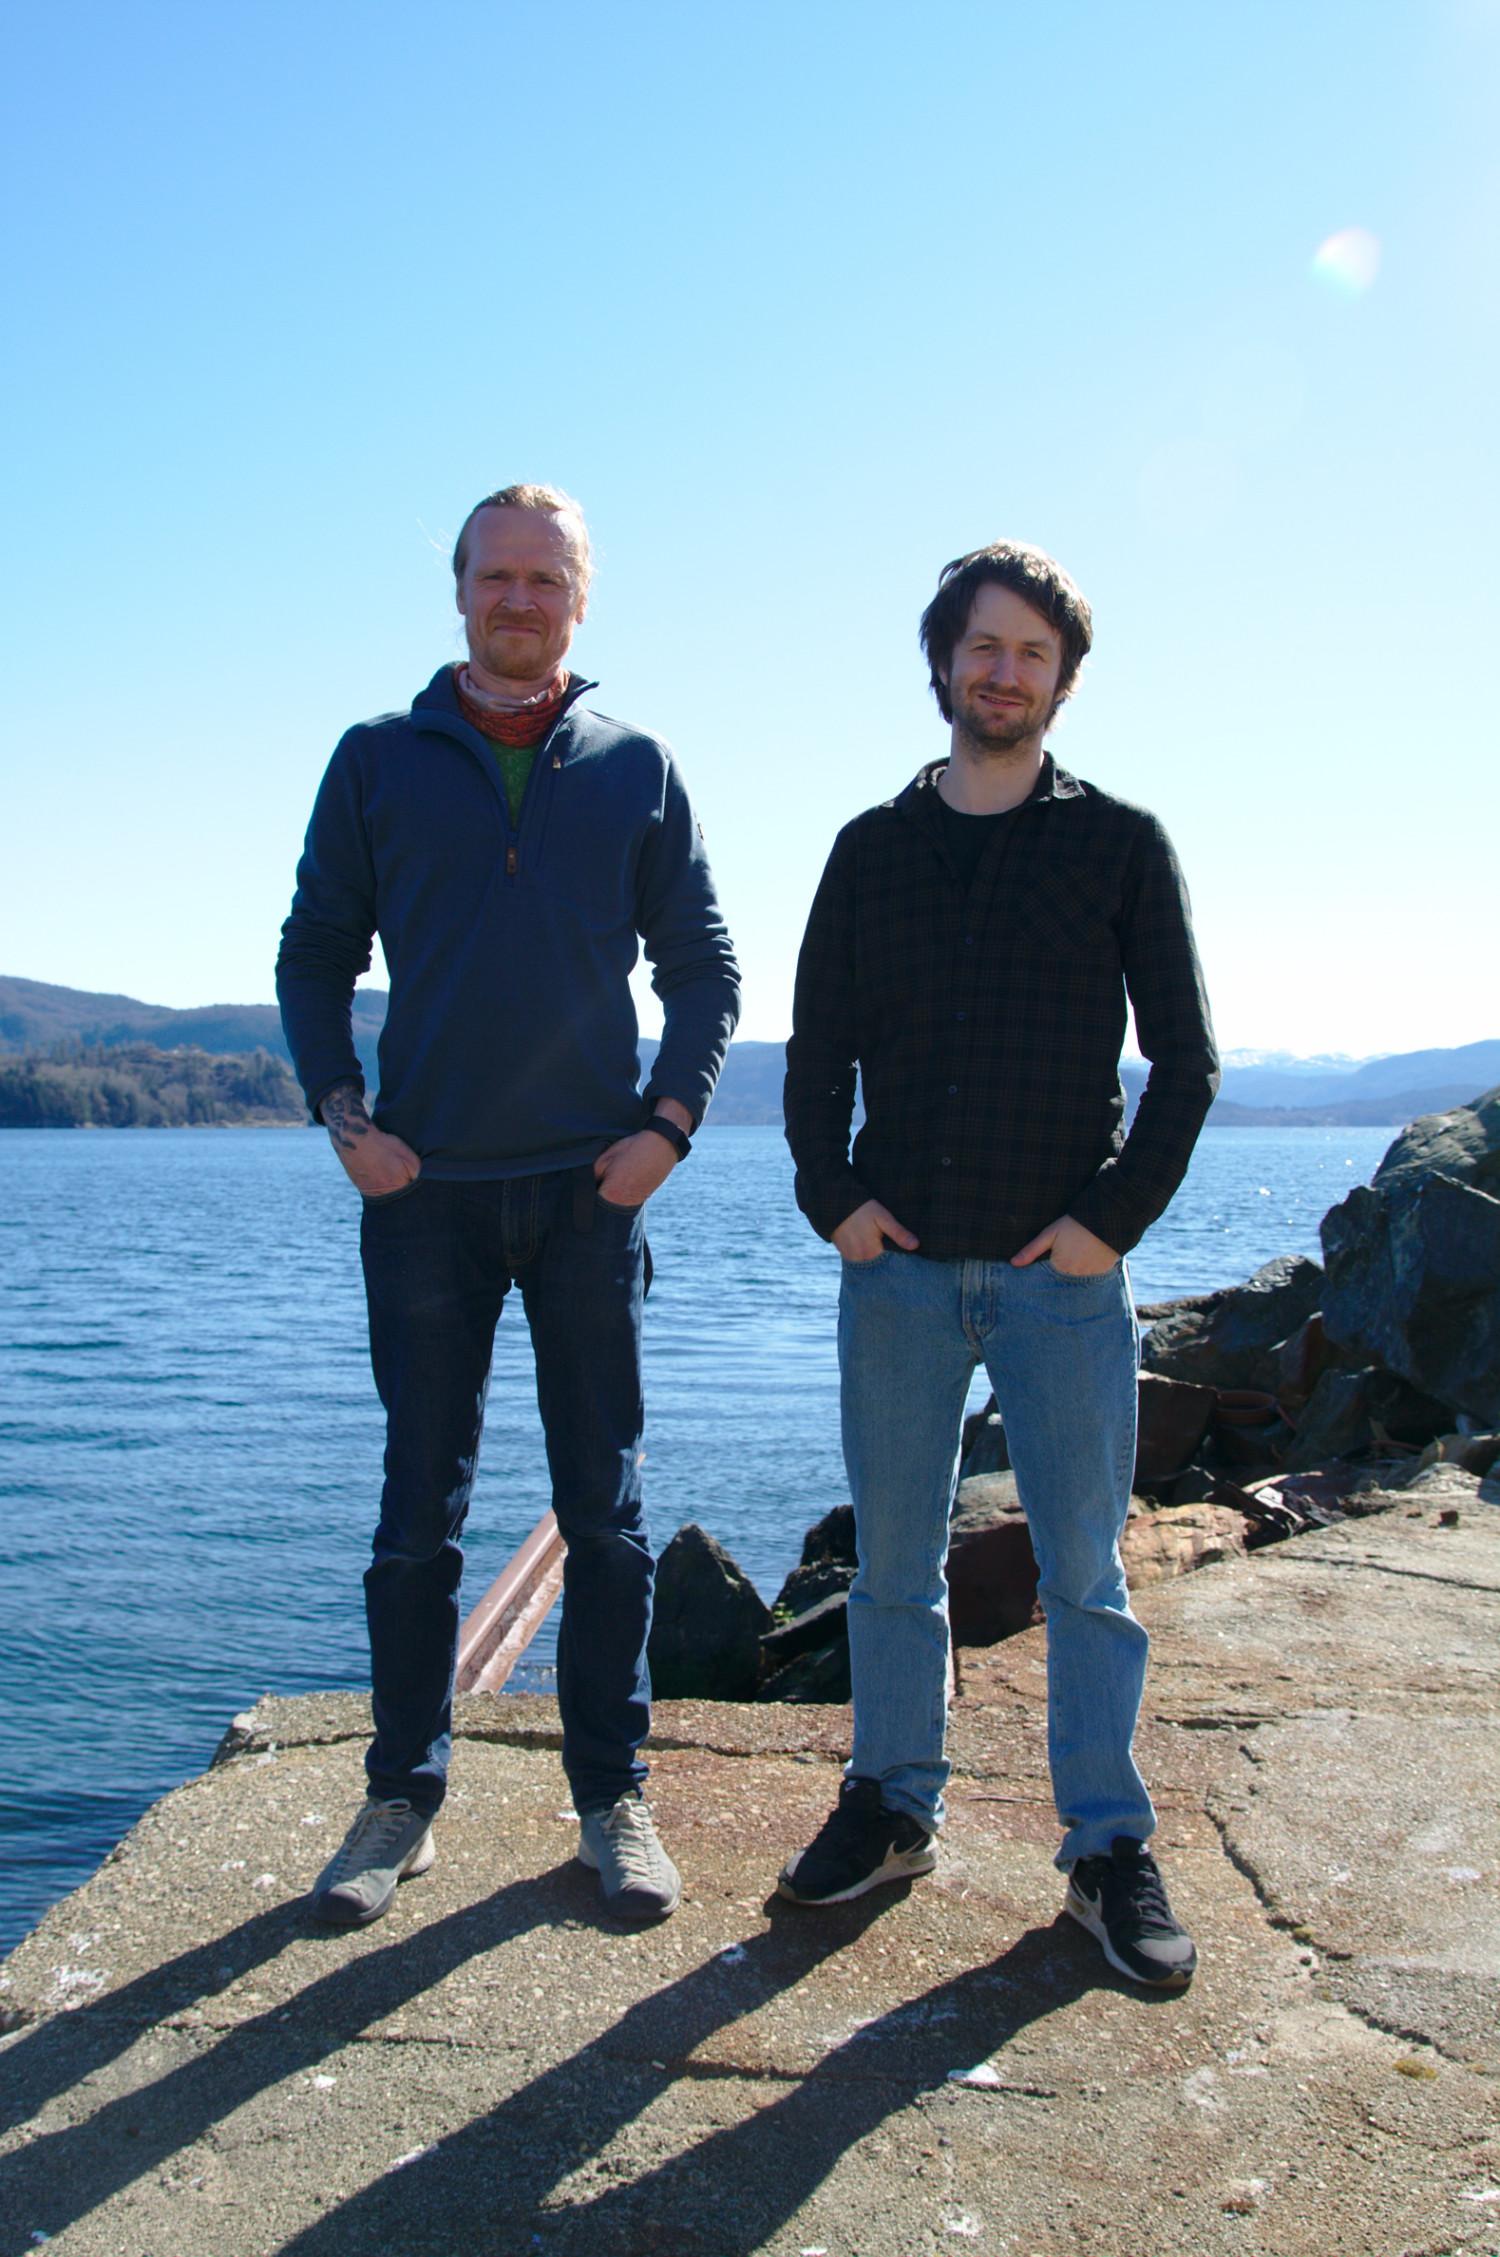 Svein-Erik Helle and Jan Steffen Helle On the dock.jpg